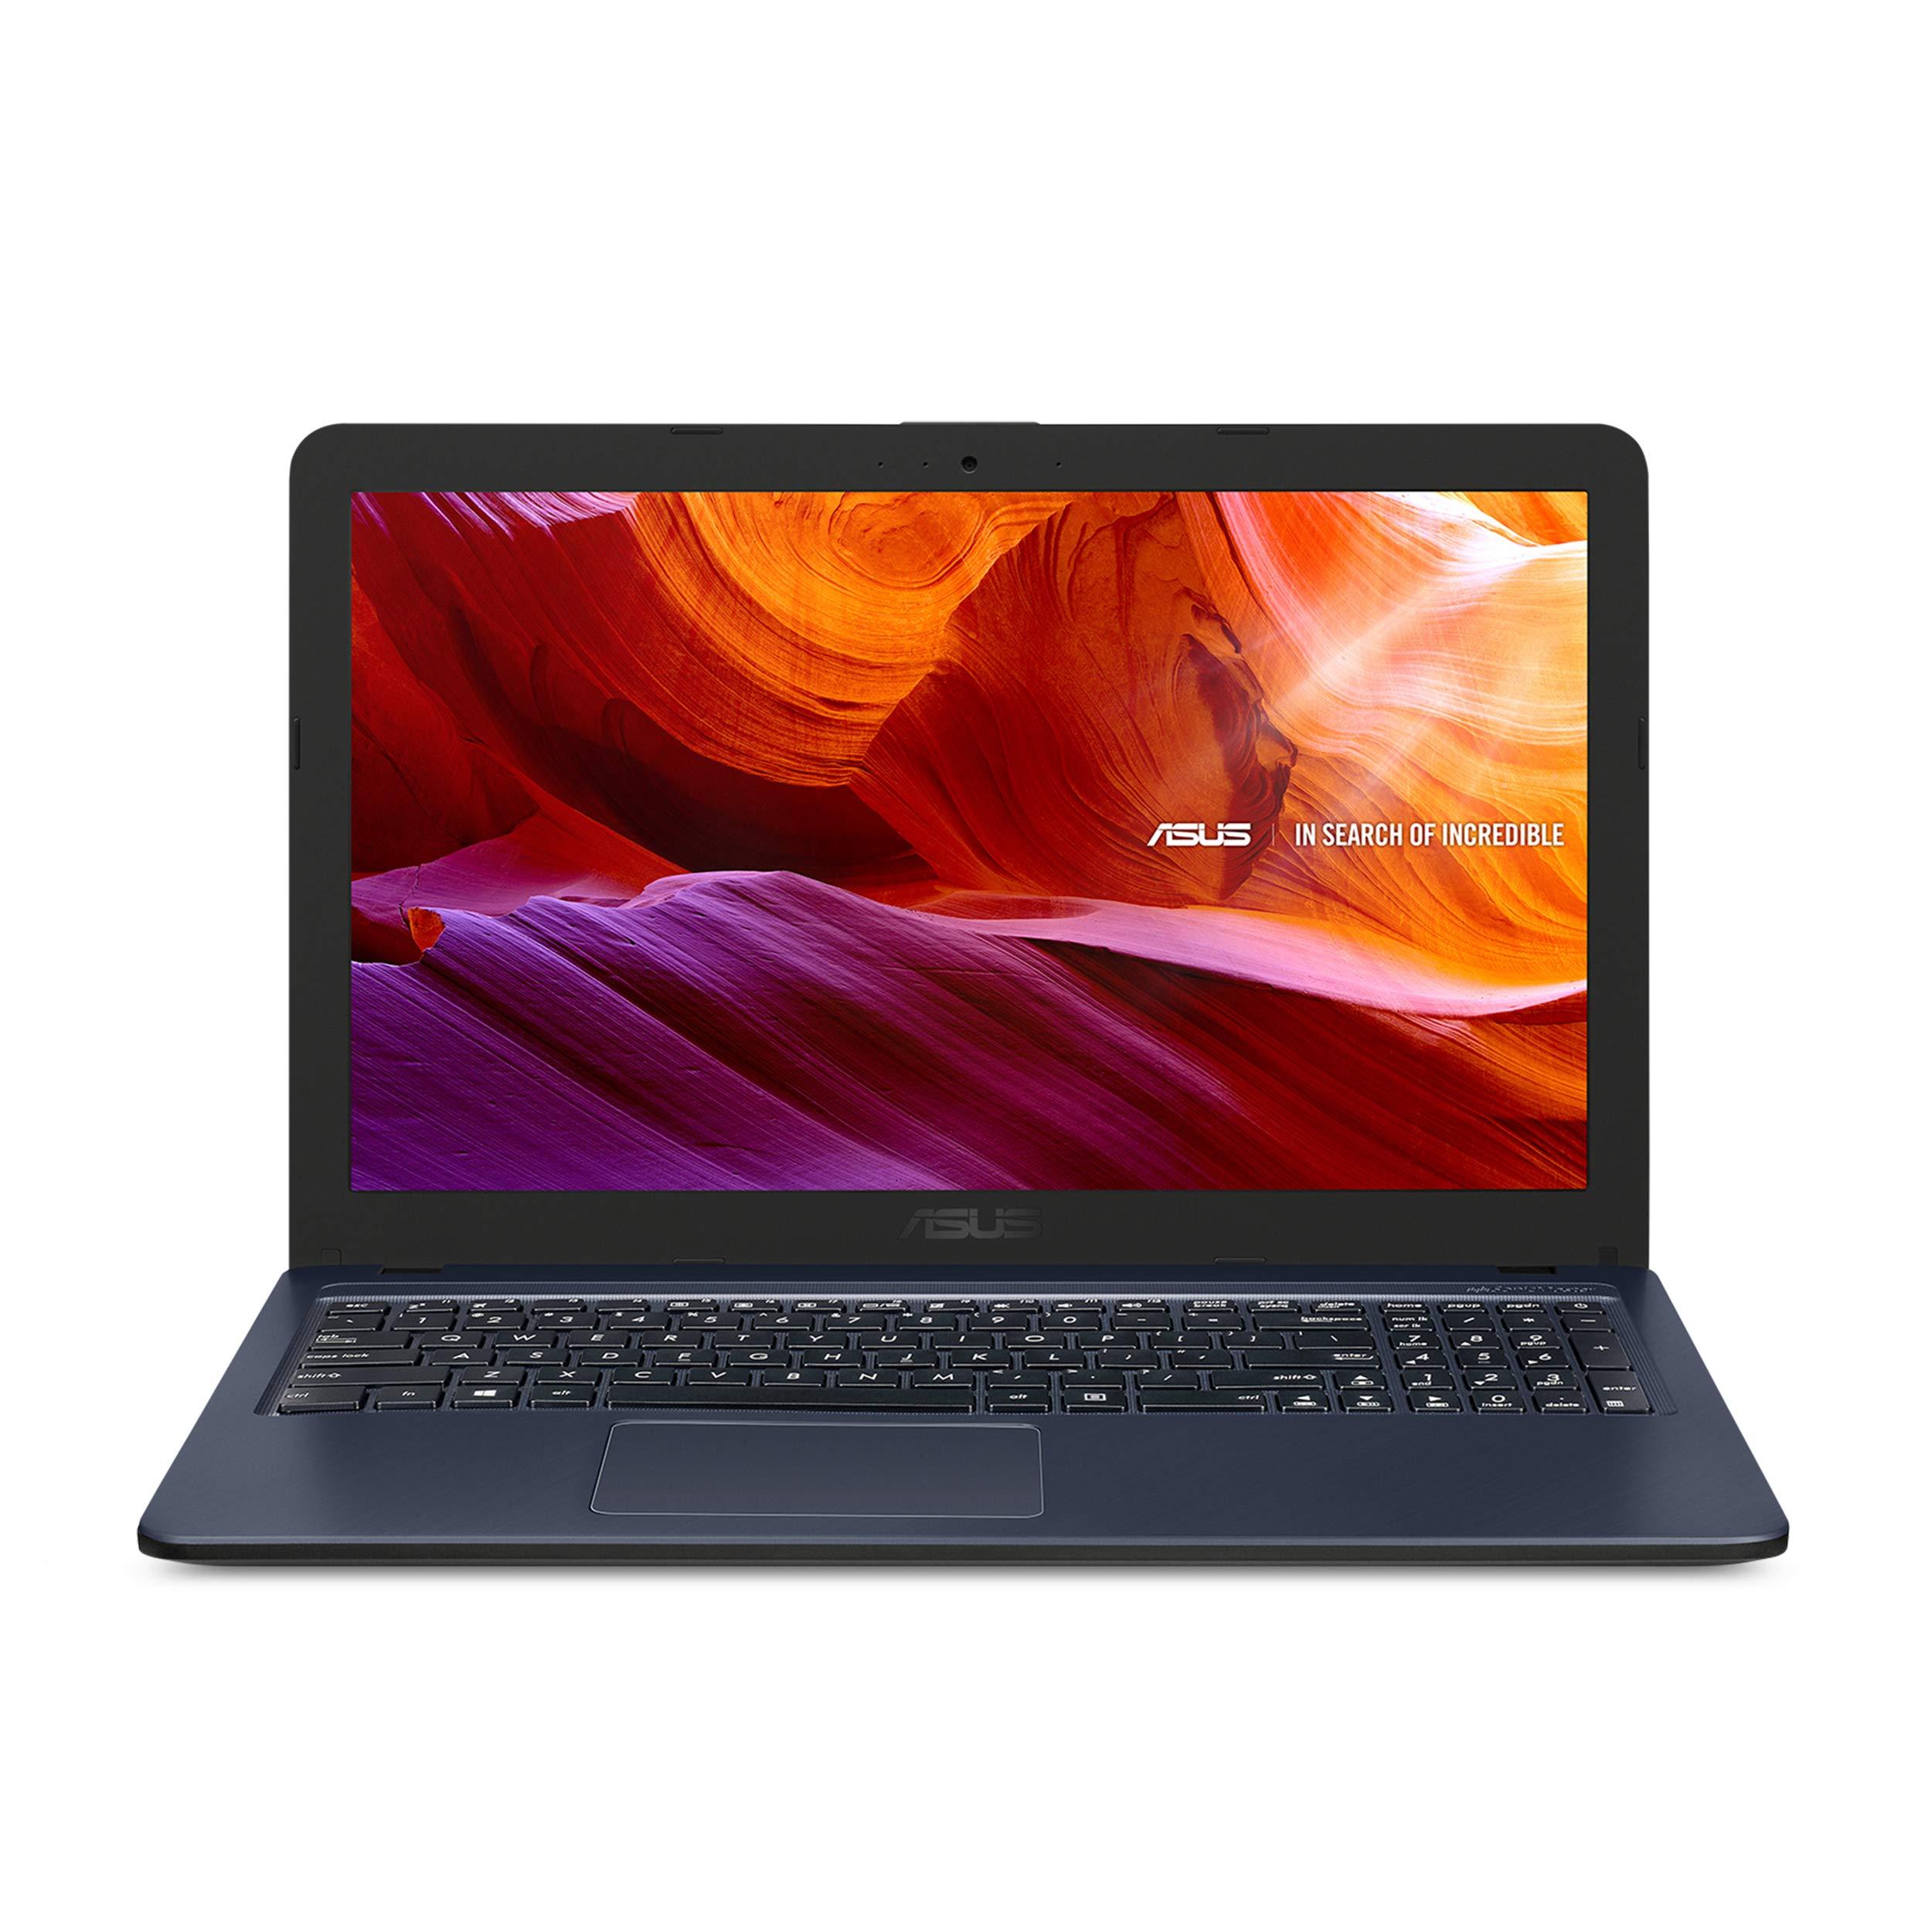 "Asus 90NB0IR7-M10510 15.6"" HD Laptop, Intel Celeron N4000 (4M Cache, up to 2.6 GHz) Processor, 4GB RAM, 1TB HDD, Windows 10, Star Gray, R543MA-RB04"